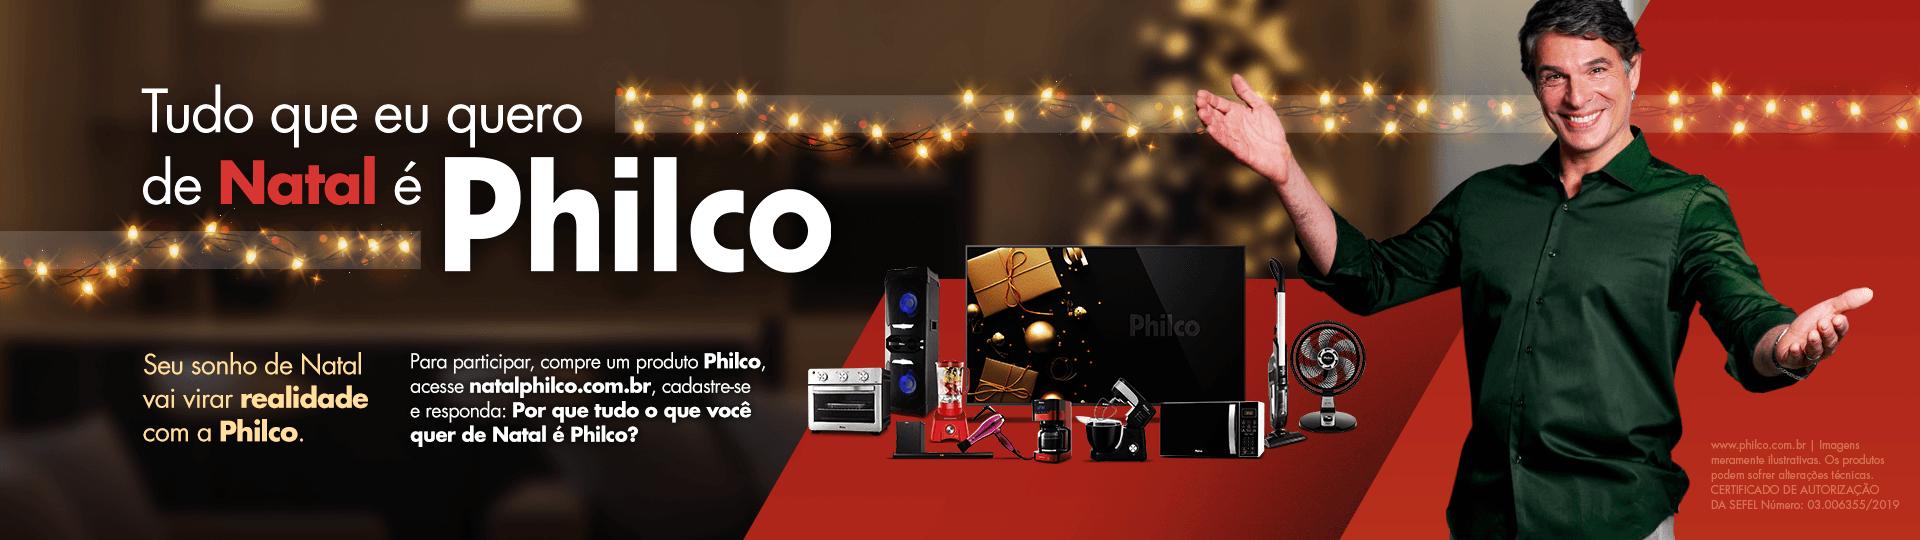 Natal Philco